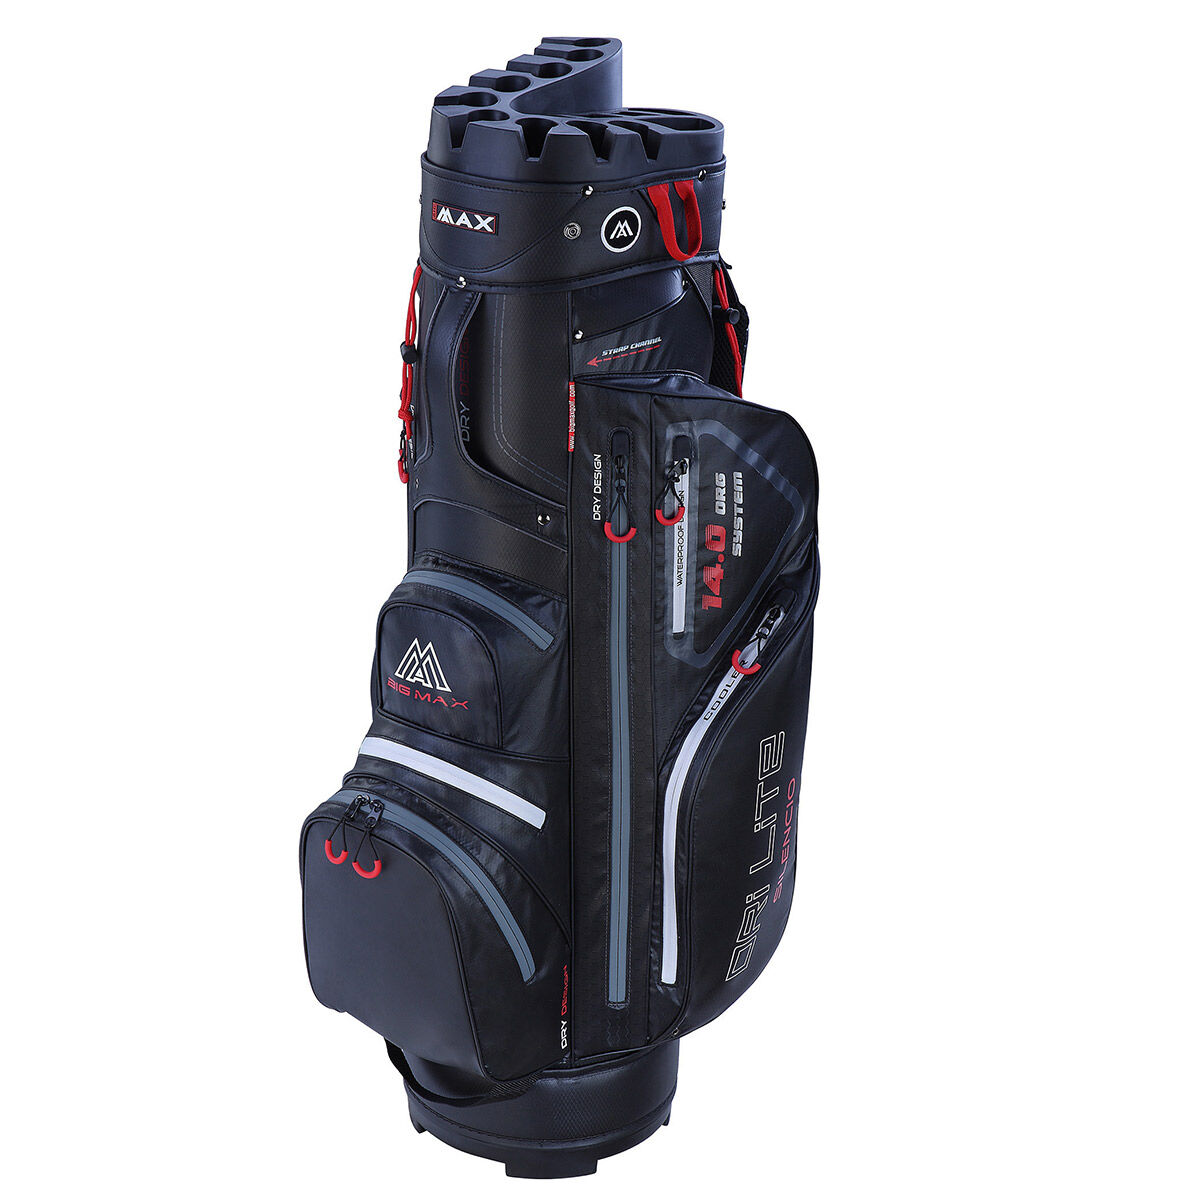 BIG MAX Dri Lite Silencio Golf Cart Bag, Black, One Size | American Golf